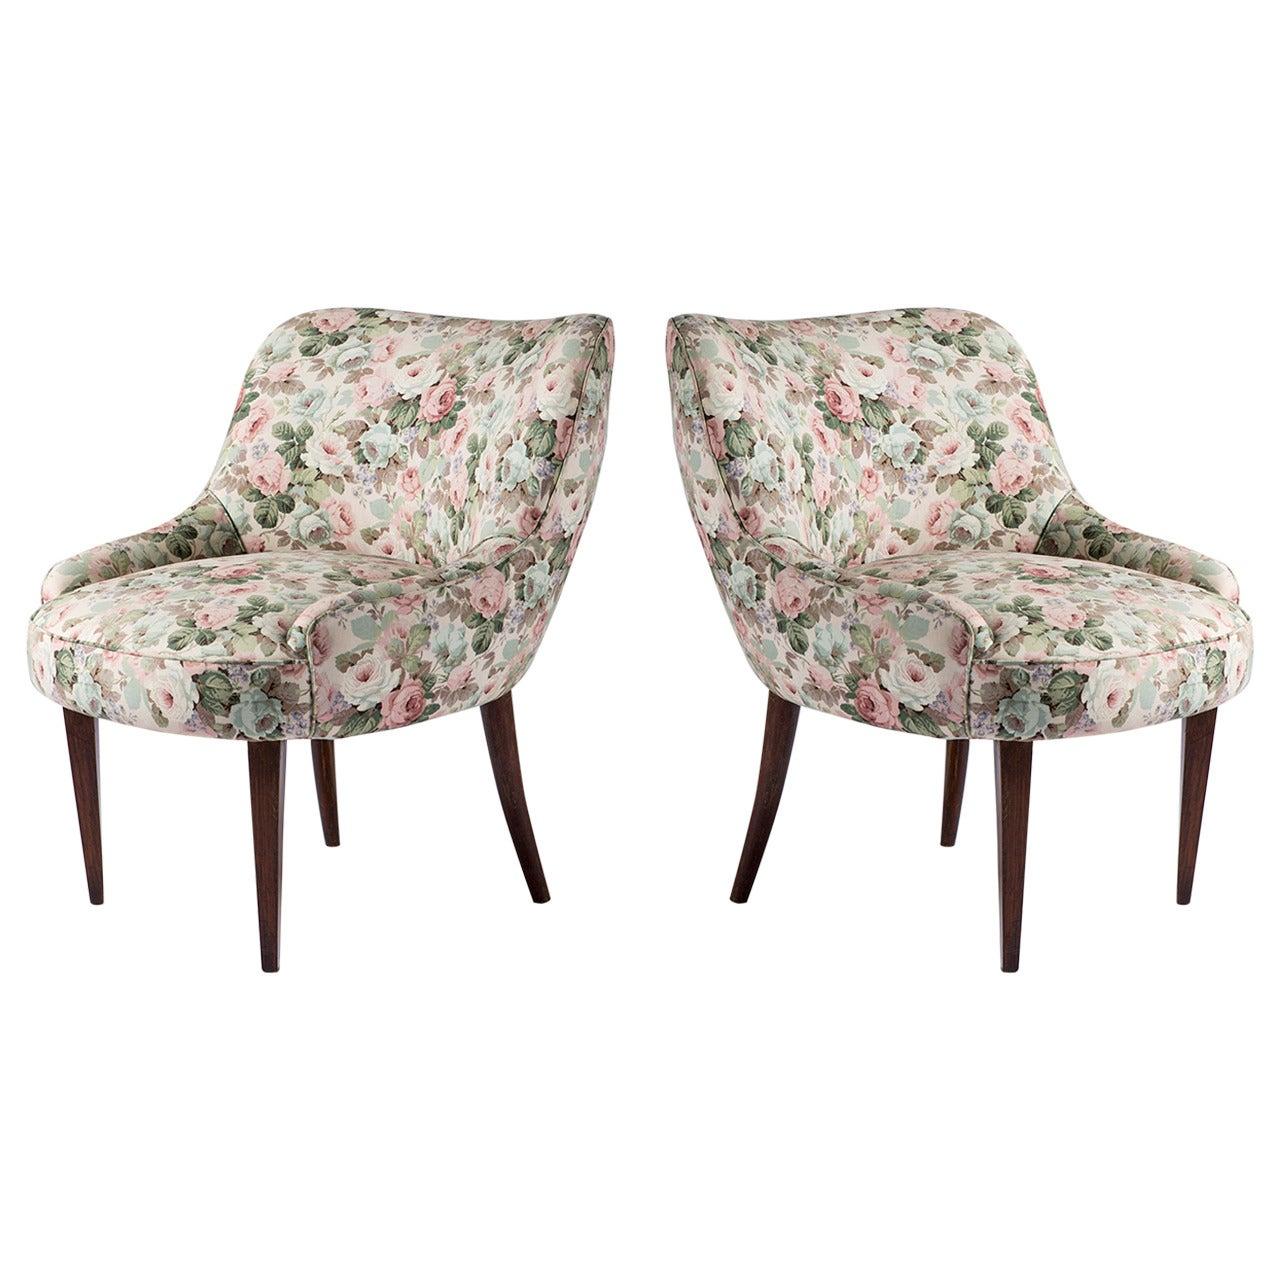 Pair of Italian 1950s Club Chairs